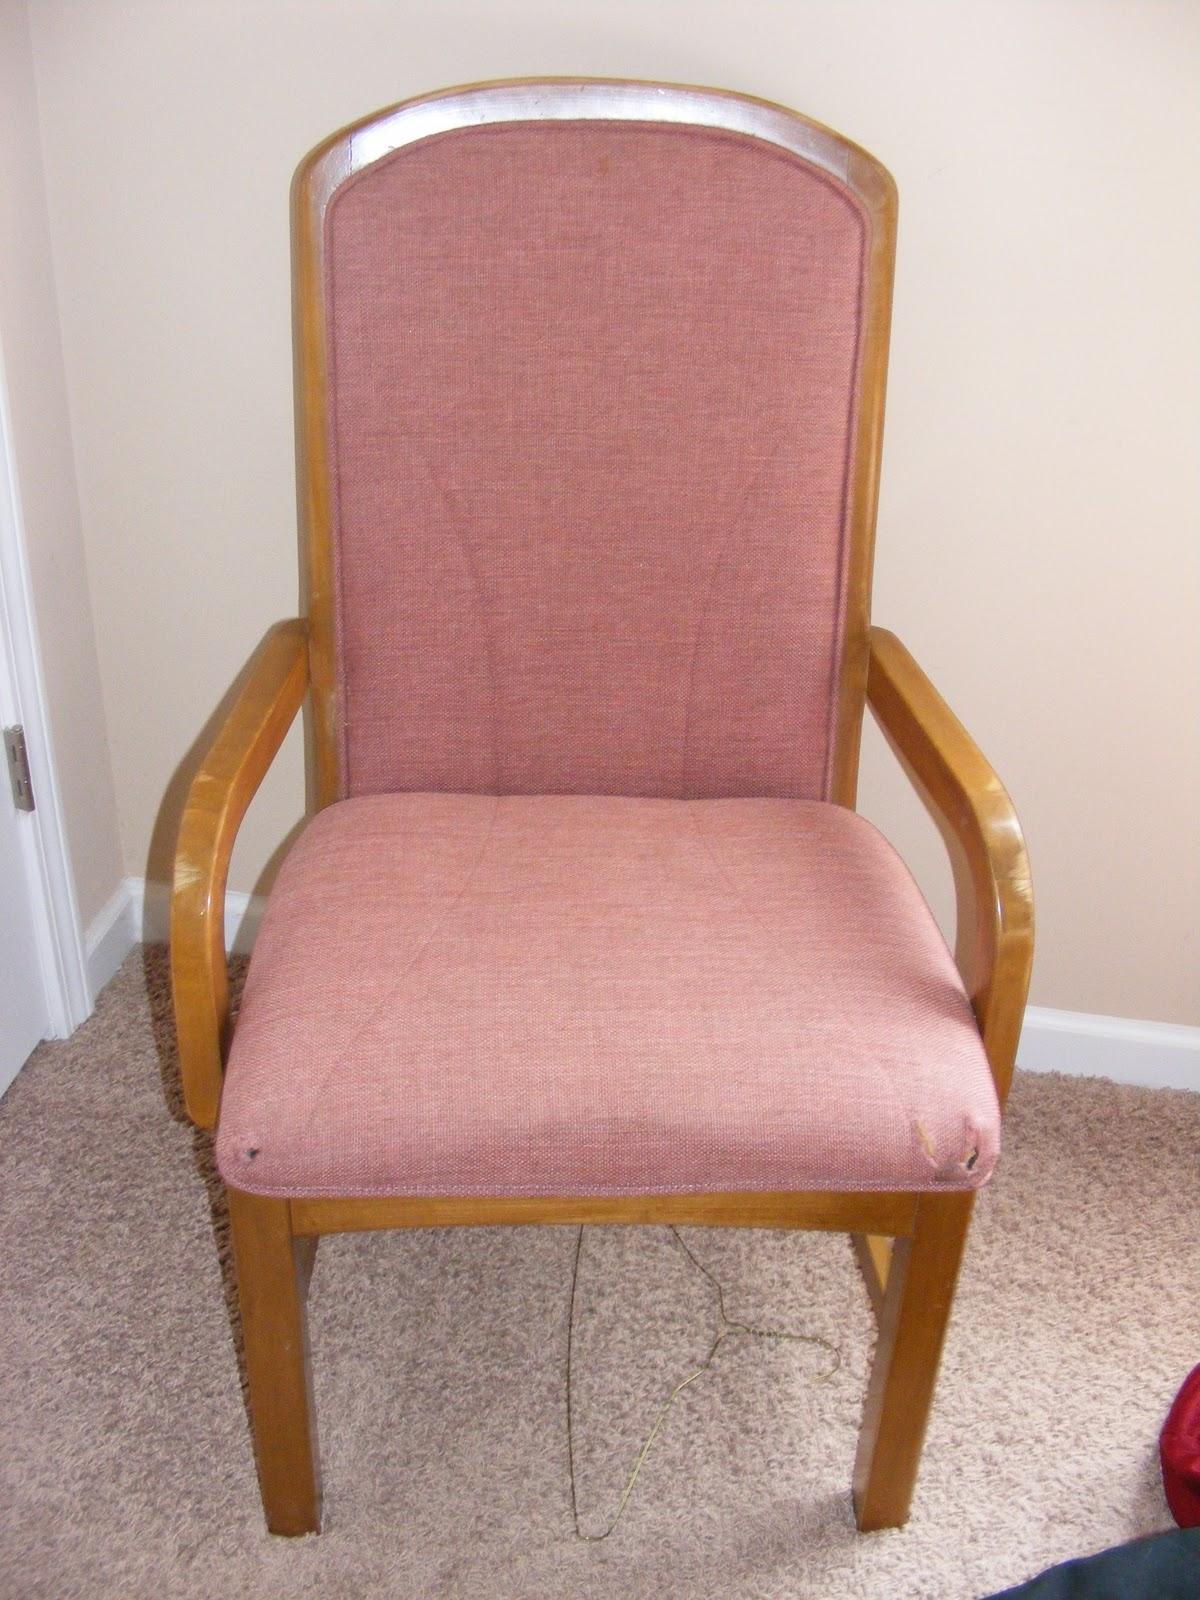 Easy Breezy: Ugly Chair Part Deaux